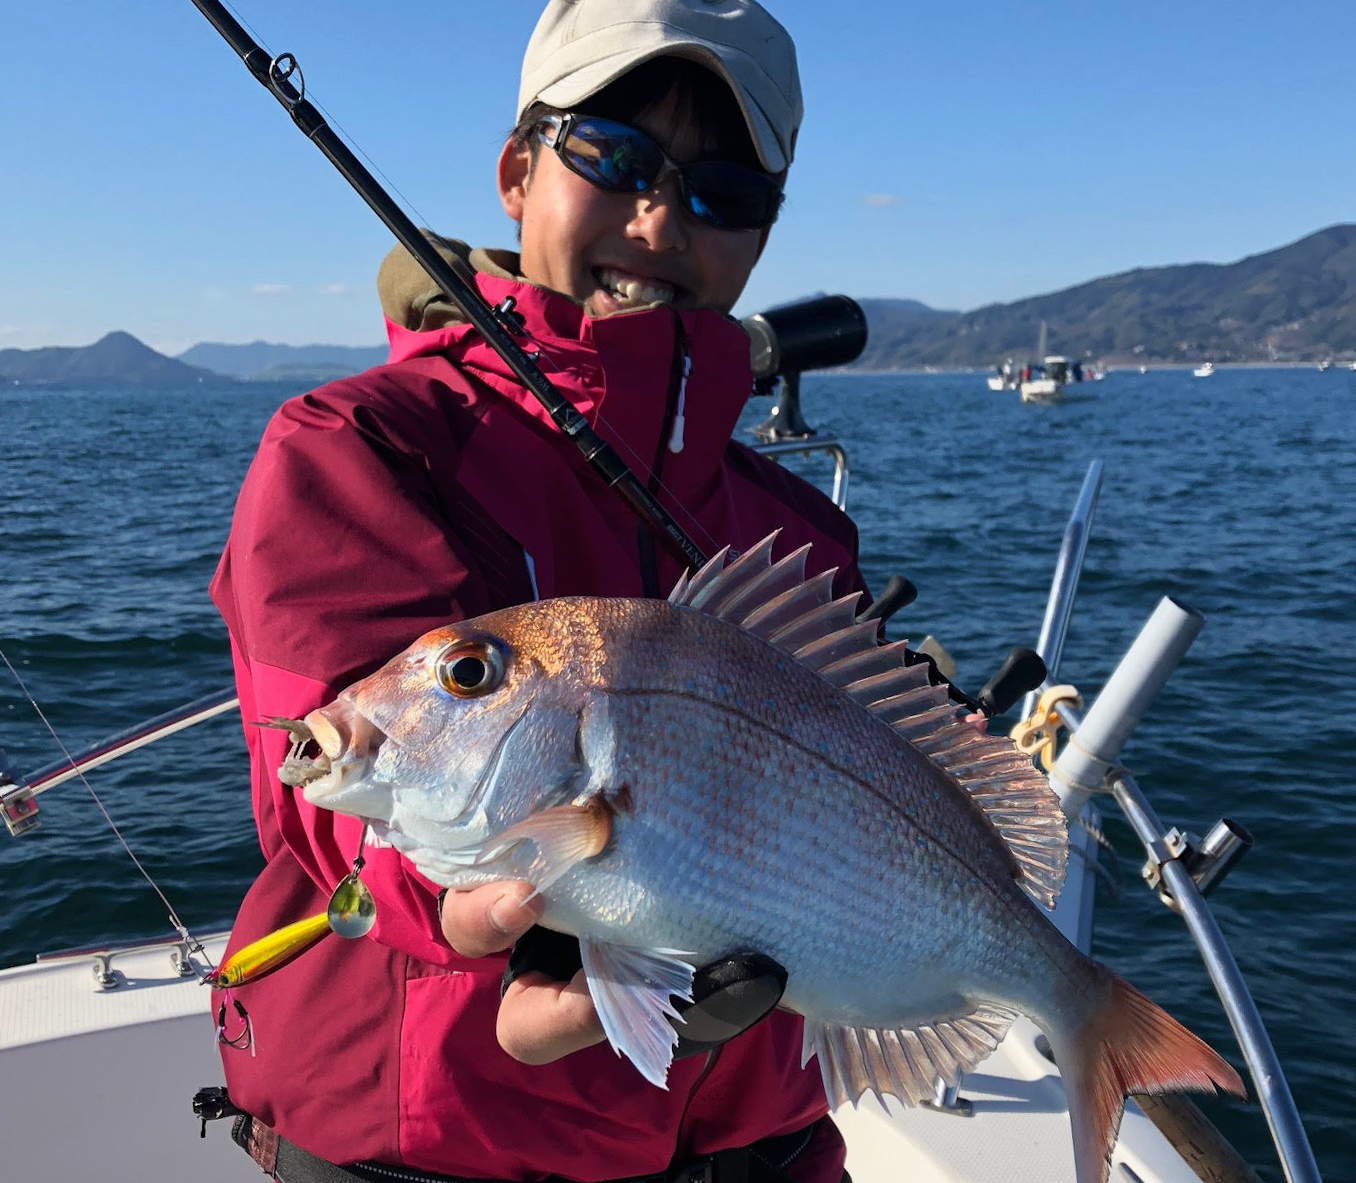 BRIST VENDAVAL8.9Mで正月に相応しい魚を求めて初釣りへ!